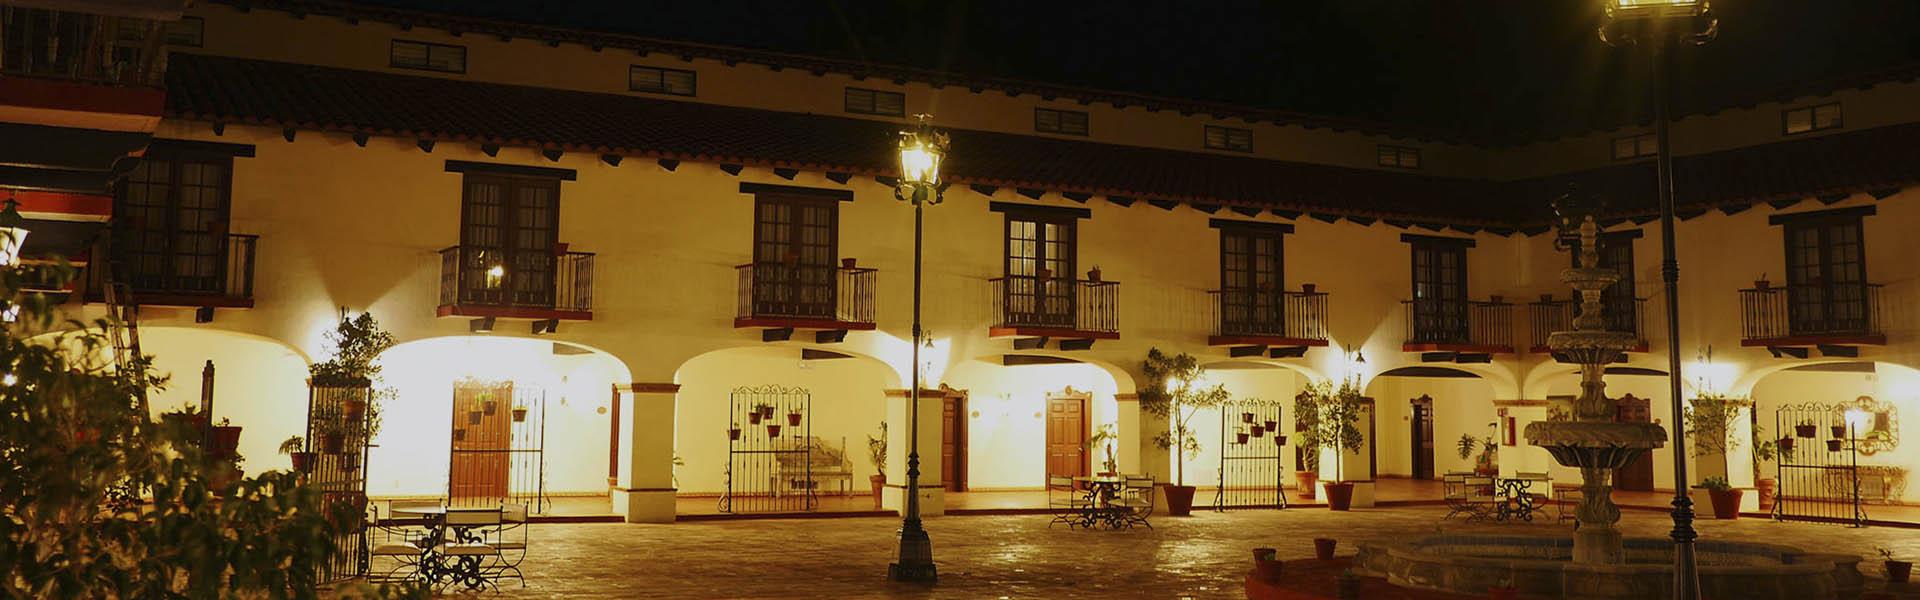 Hotel Hacienda Bajamar